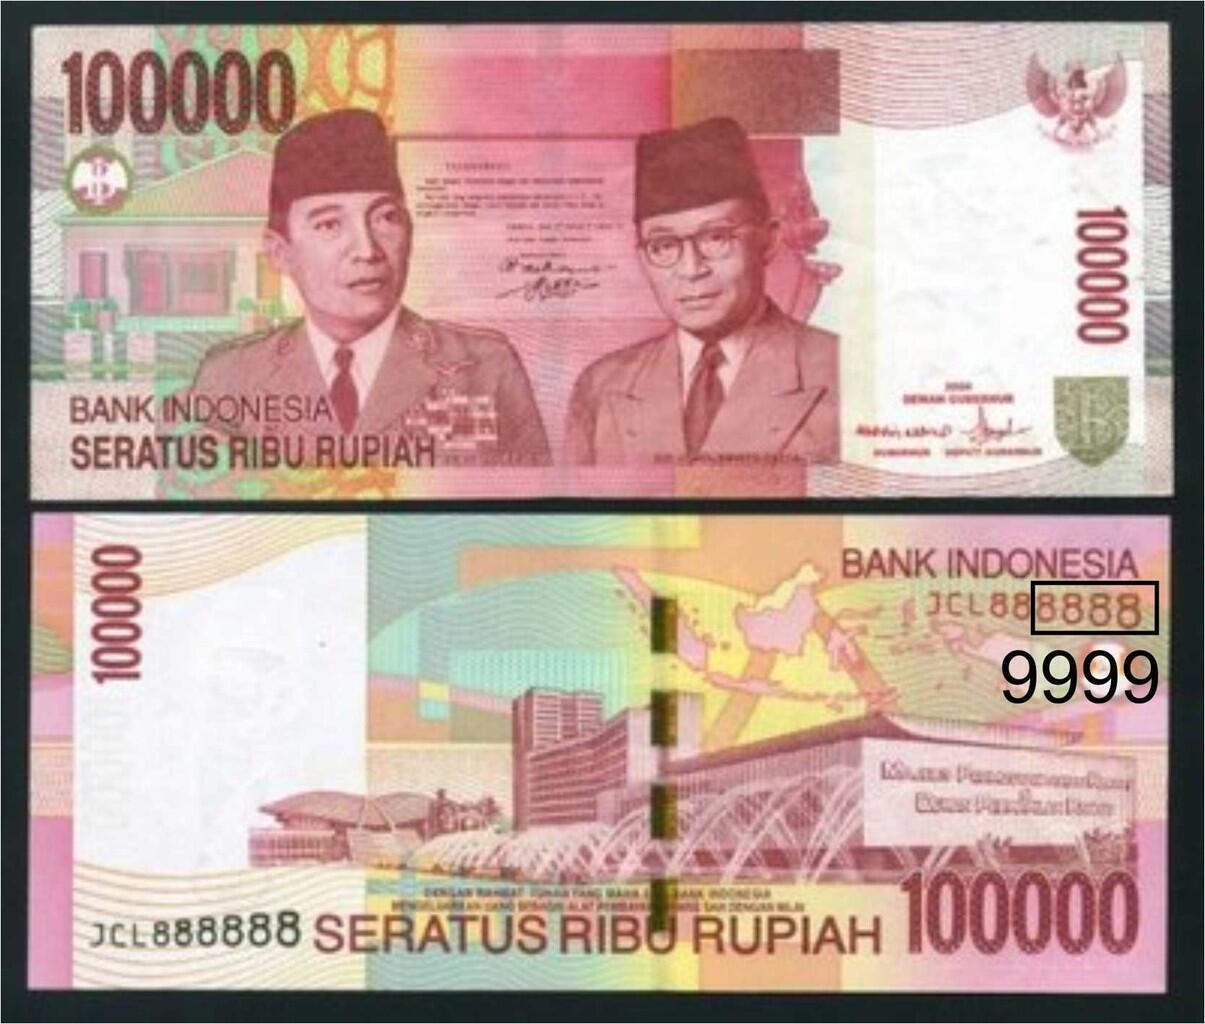 WTB uang kertas pecahan Rp.100.000 serie 999 / 9999